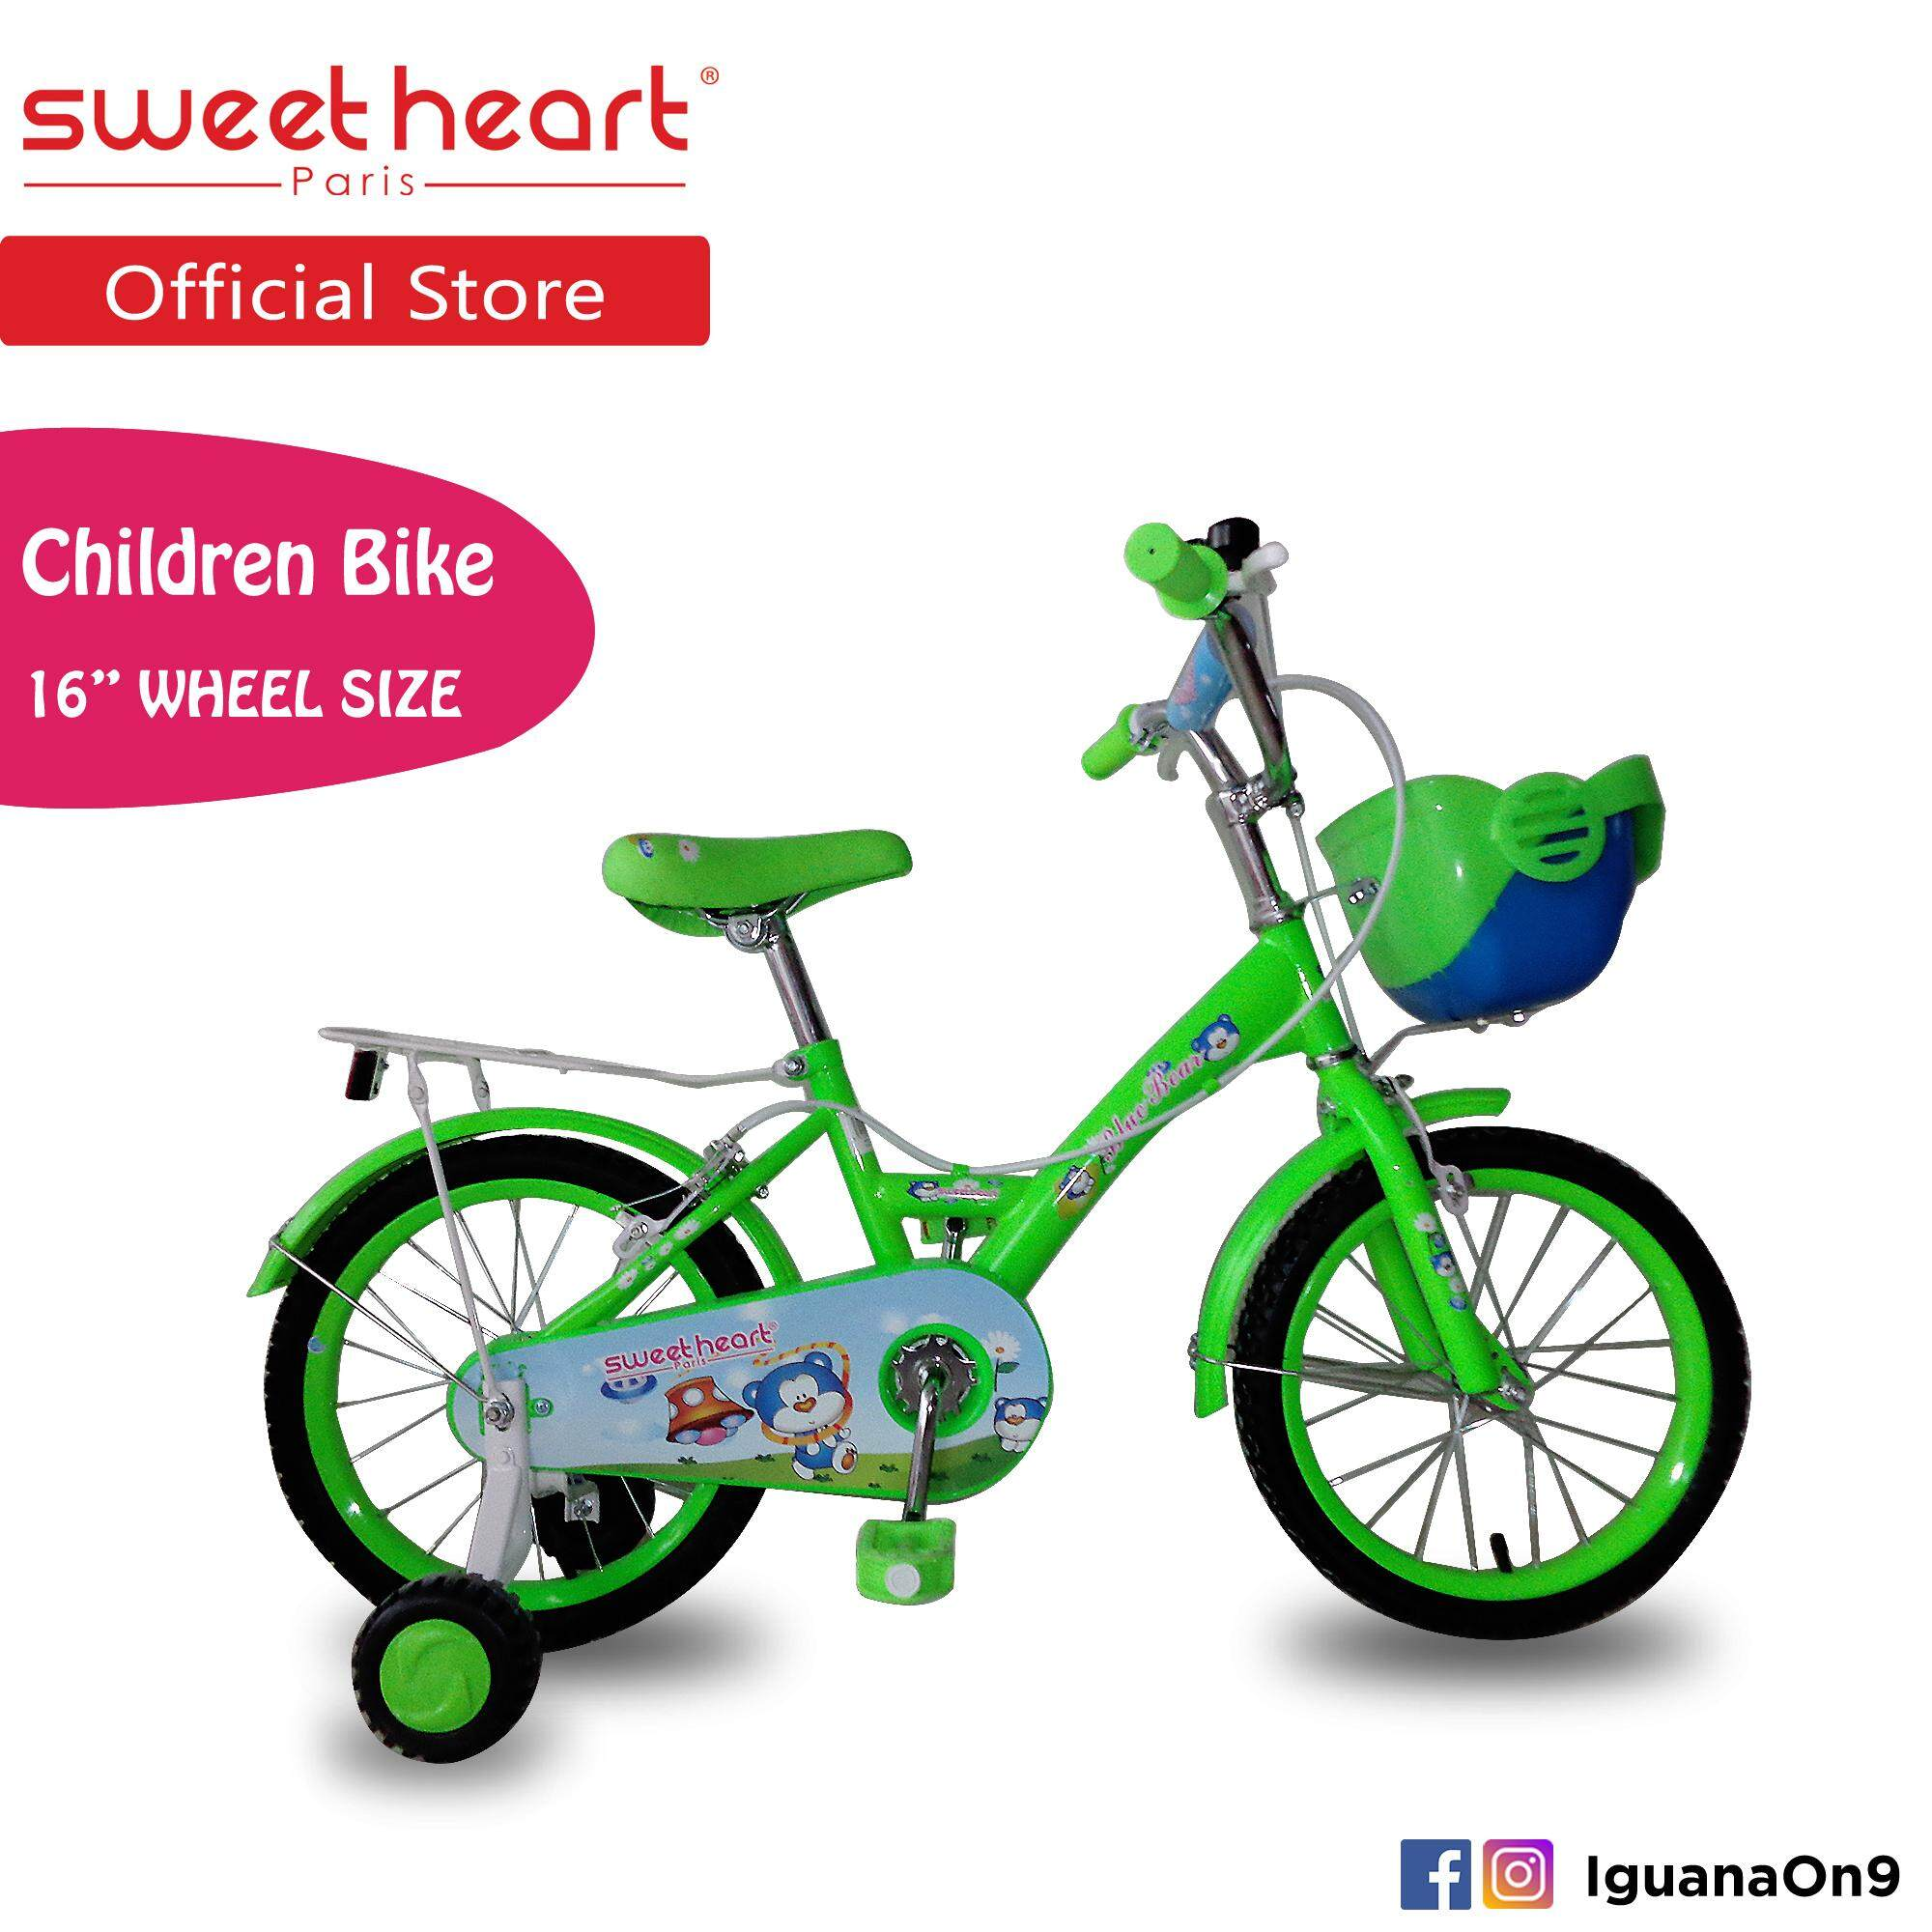 Sweet Heart Paris CB1601 BLUE BEAR (Green) Children Bike with Caliper Brake